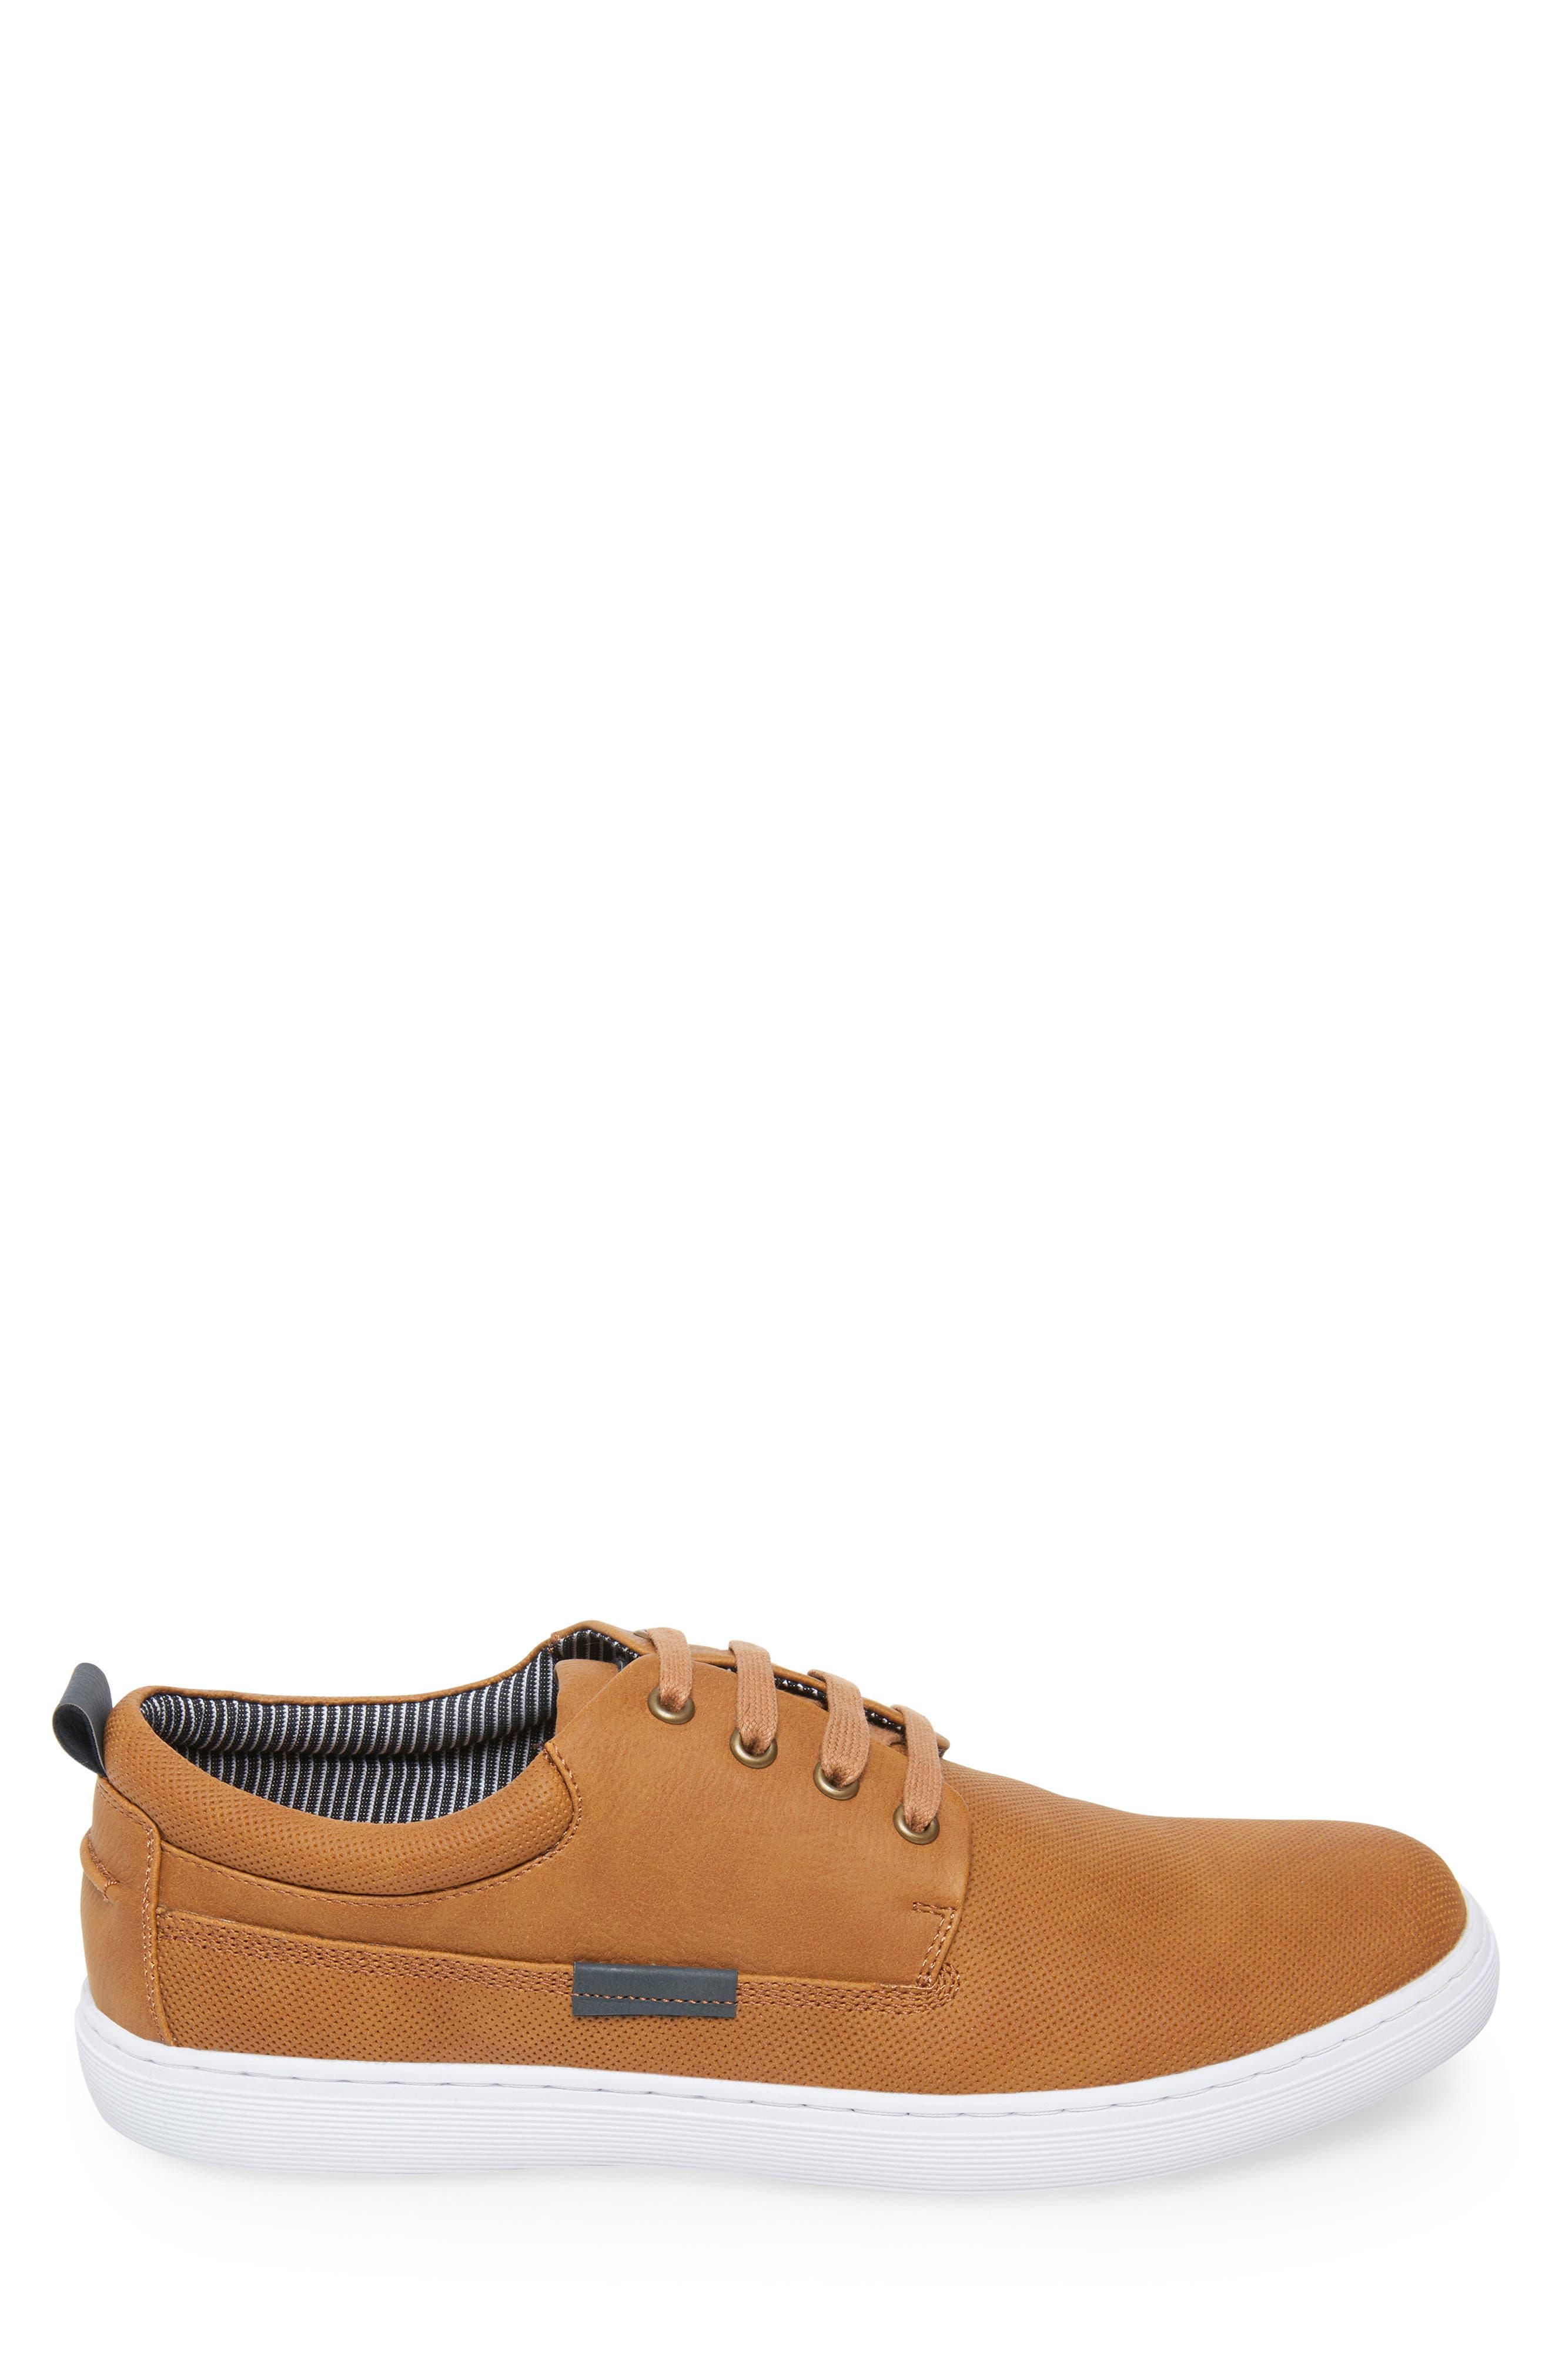 Halliday Sneaker,                             Alternate thumbnail 3, color,                             COGNAC